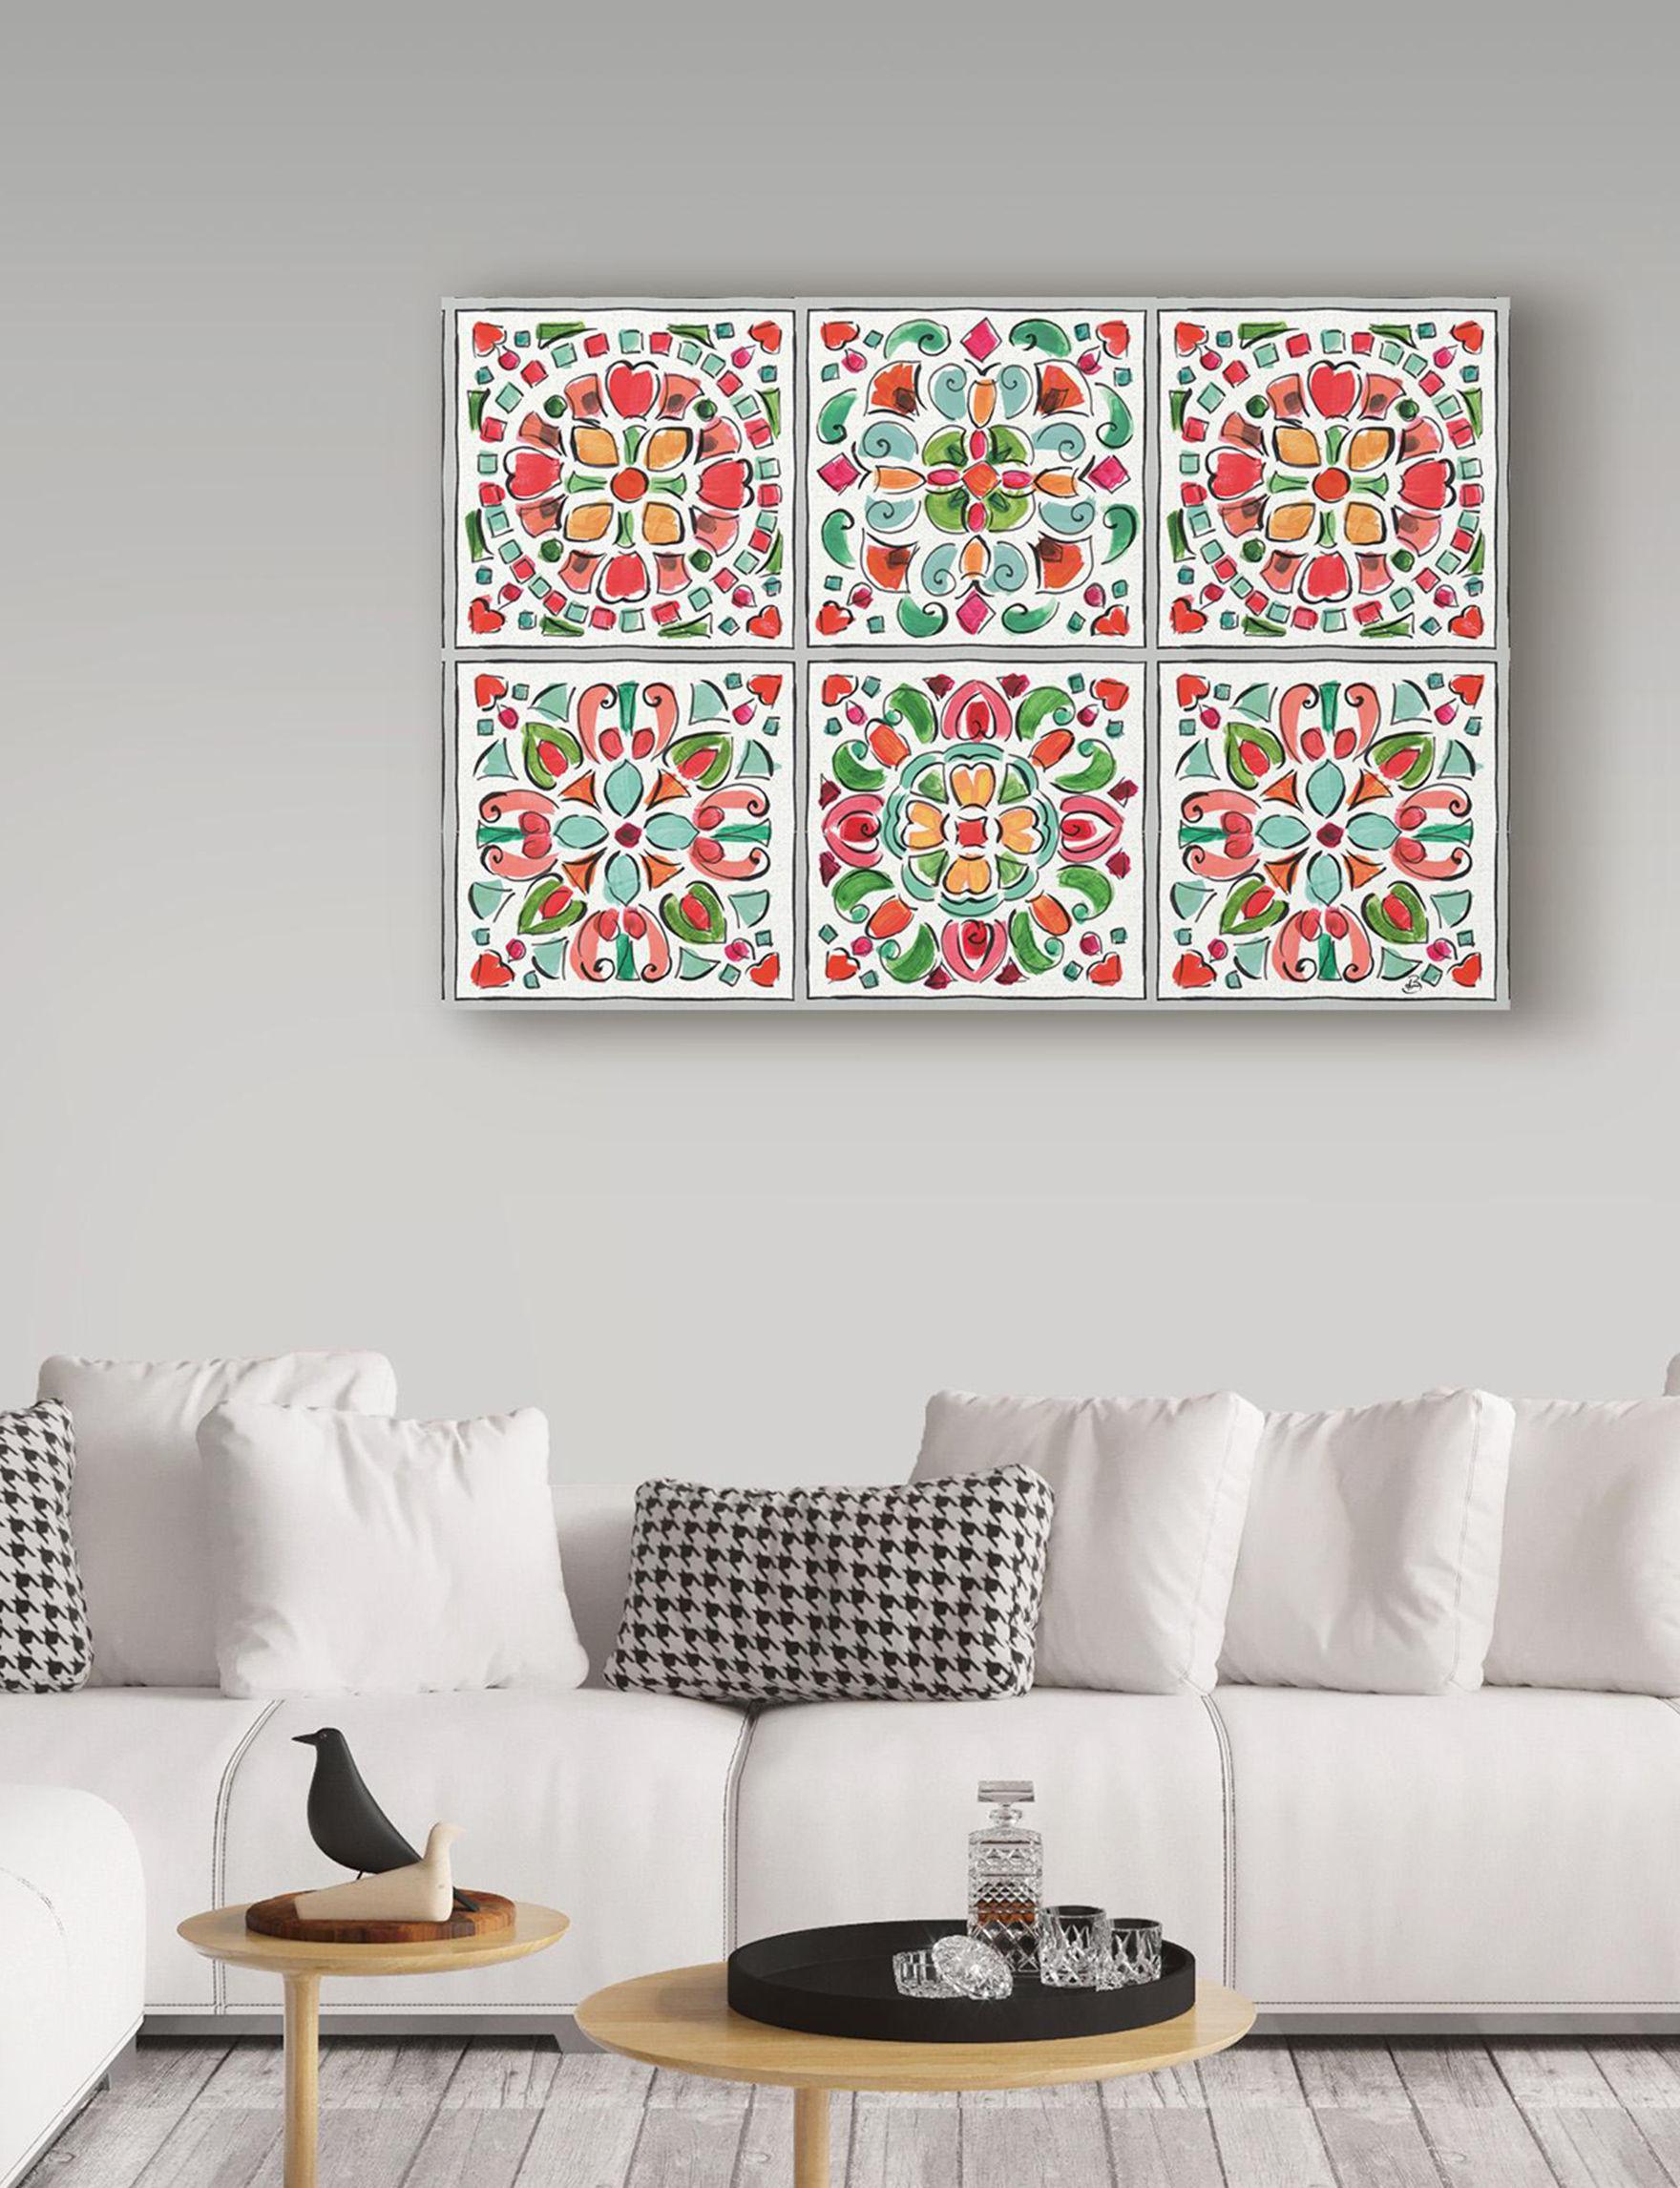 Trademark Fine Art Grey / Red Wall Art Home Accents Wall Decor